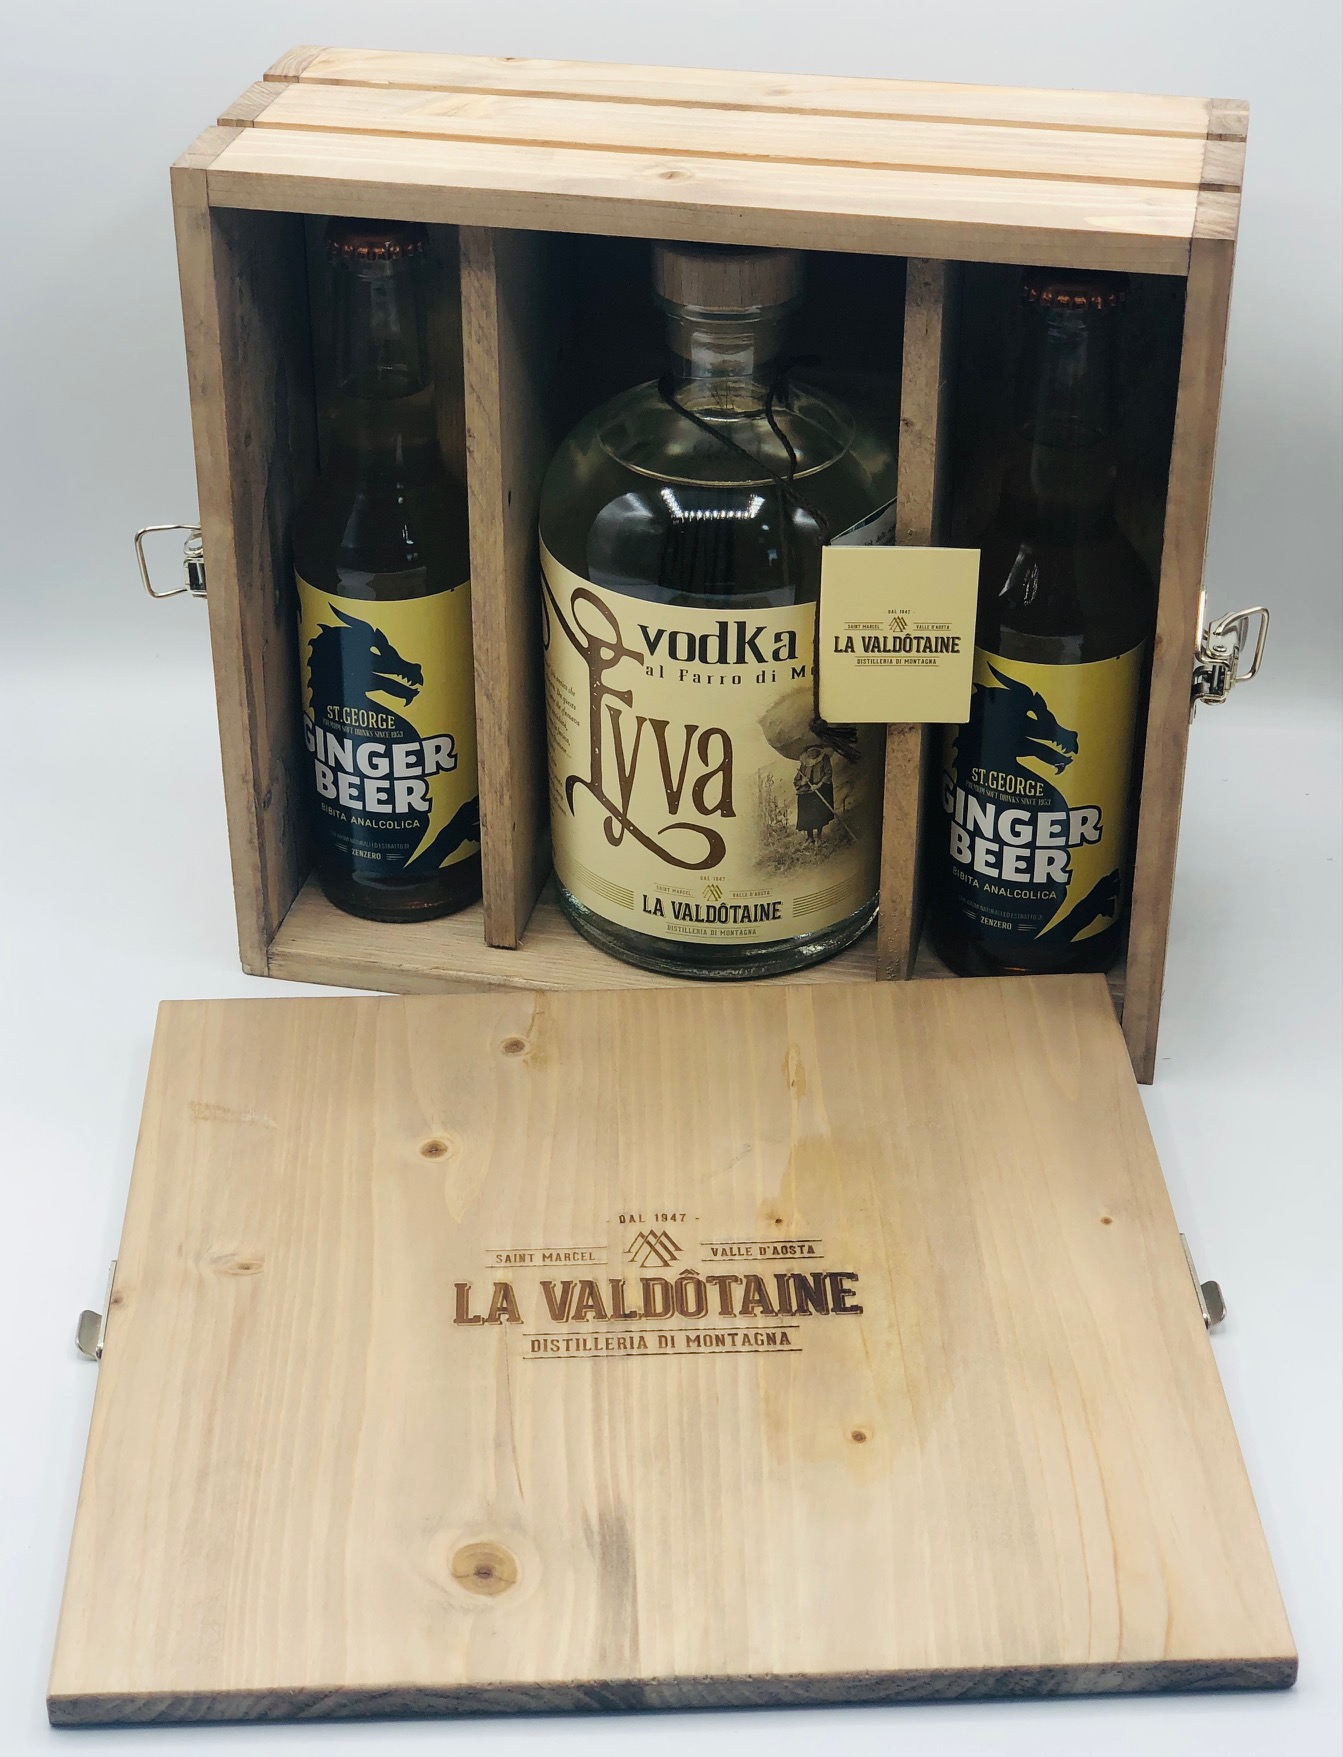 La Valdotaine - Eyva Vodka al Farro di Montagna LT.1 + 2 Ginger Beer 27,5